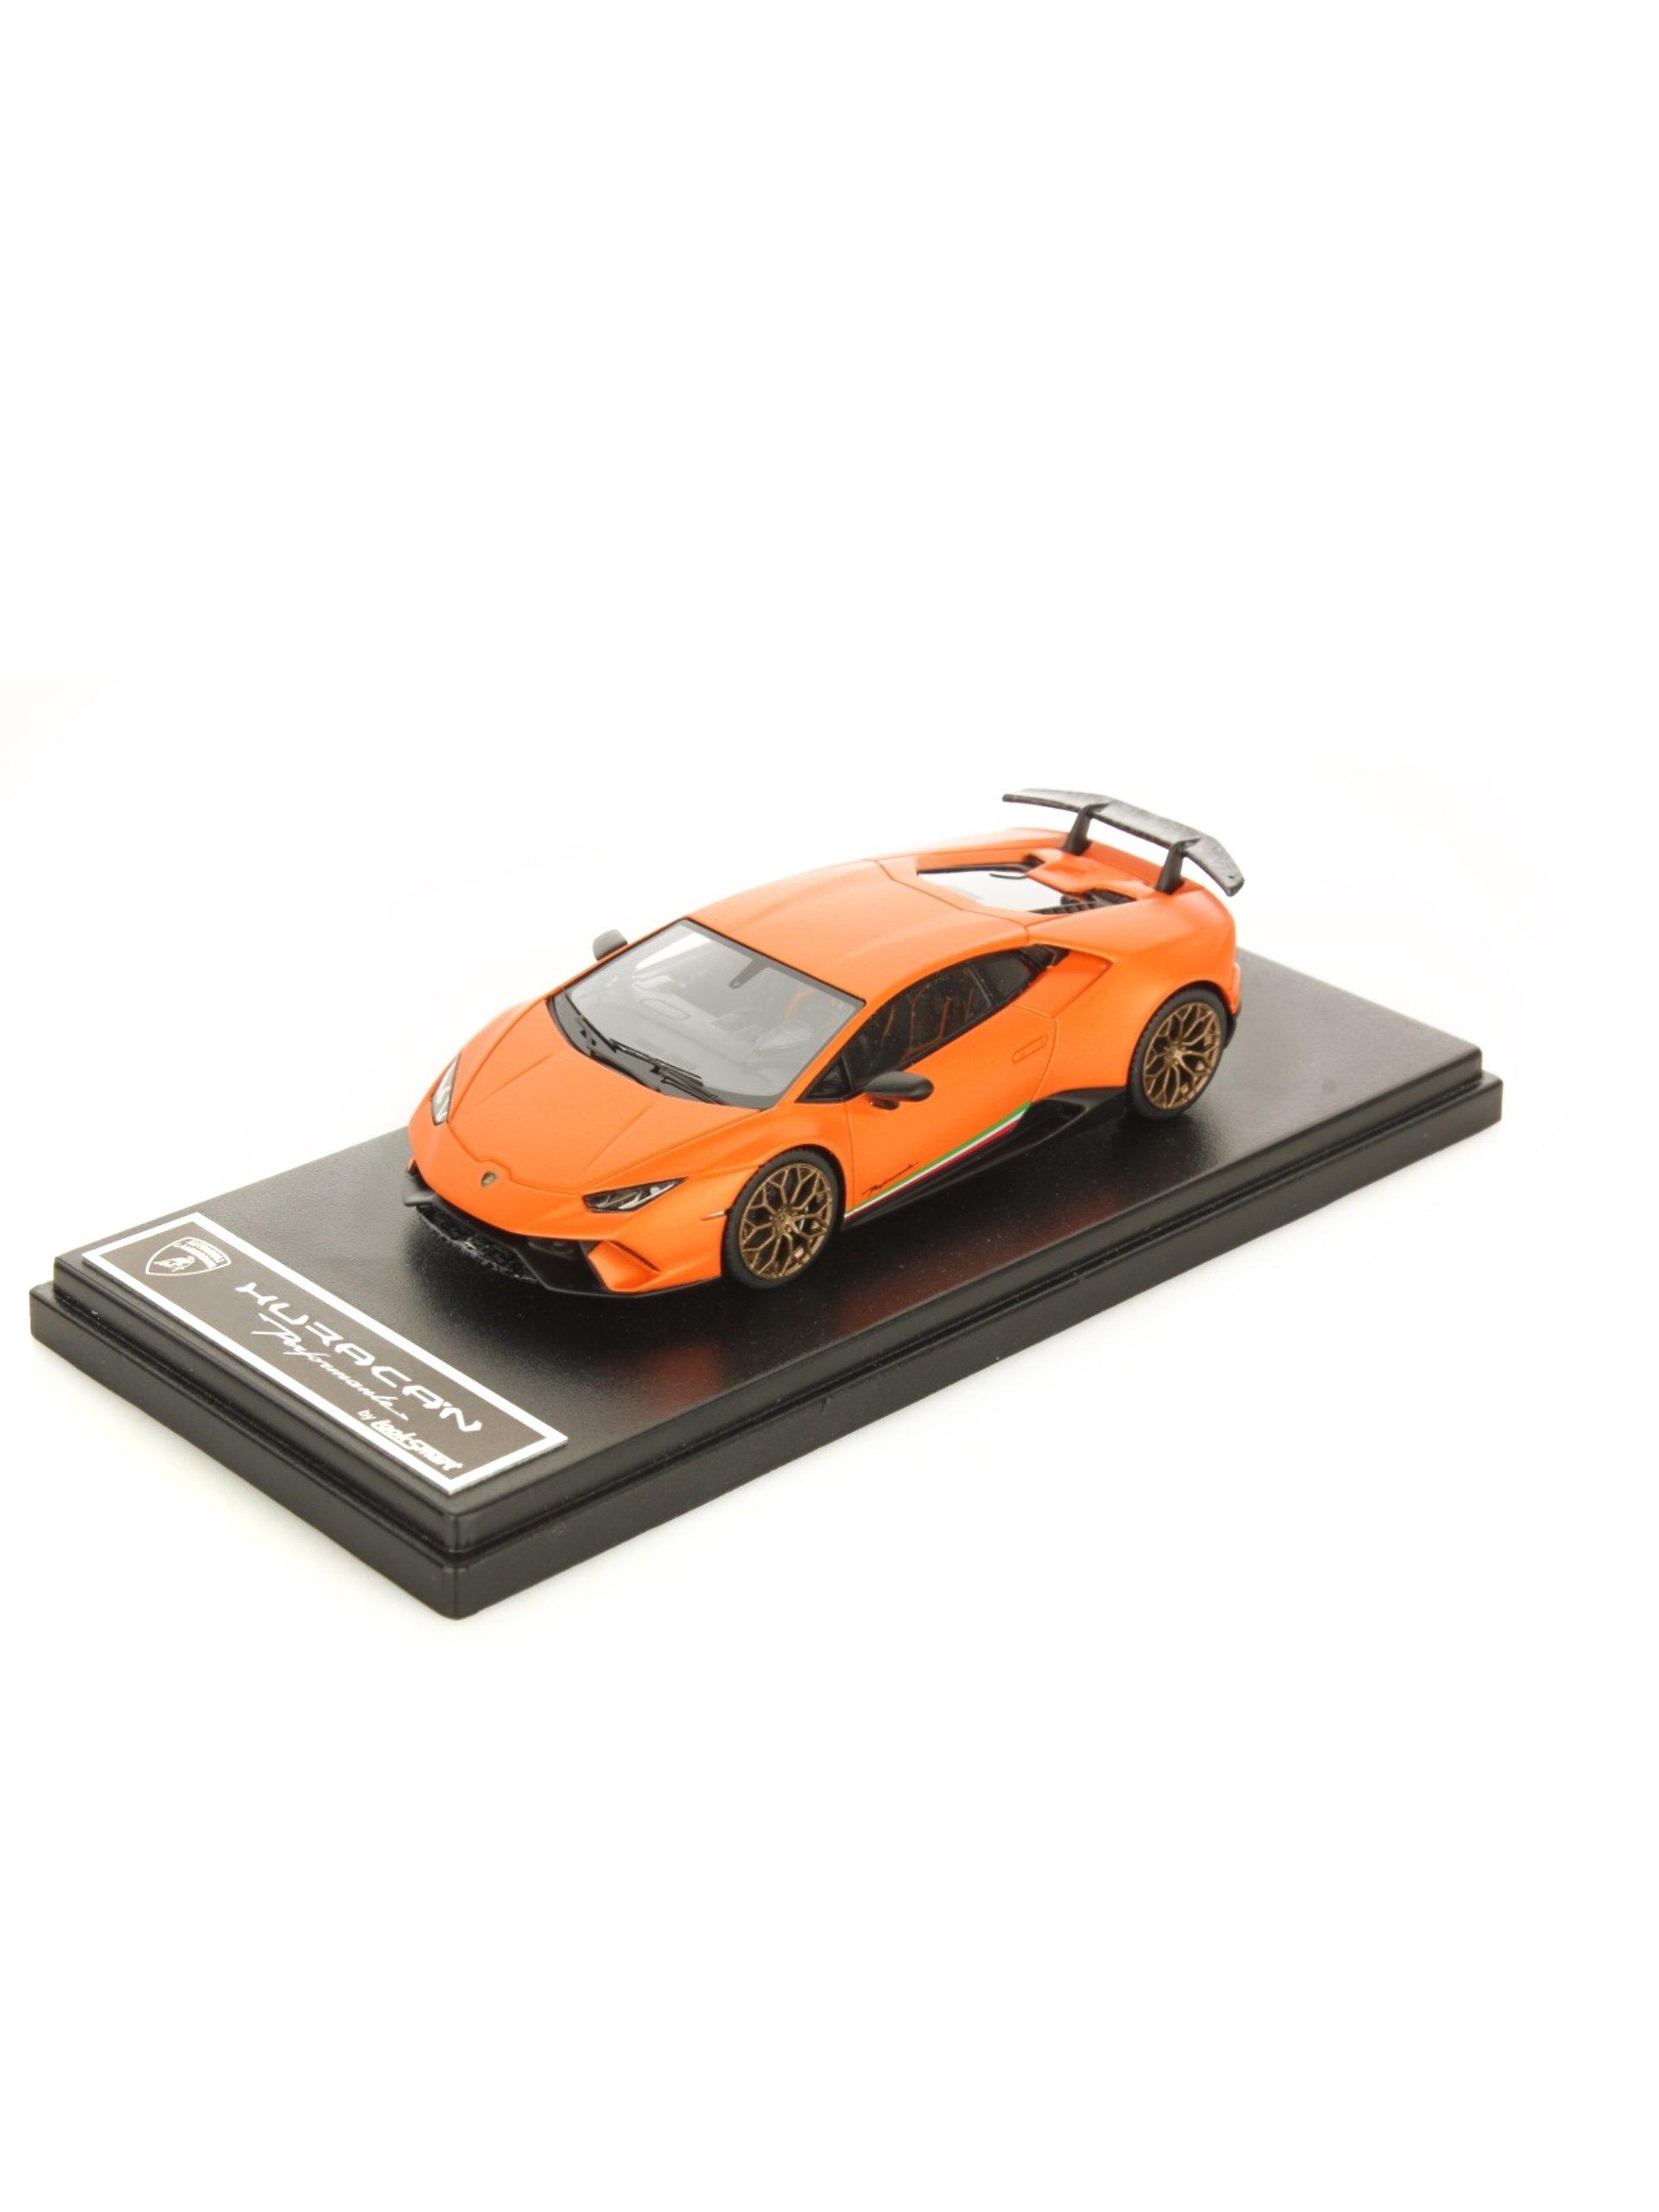 Automobili Lamborghini Lamborghini Huracán Performante scale 1:43 by Looksmart